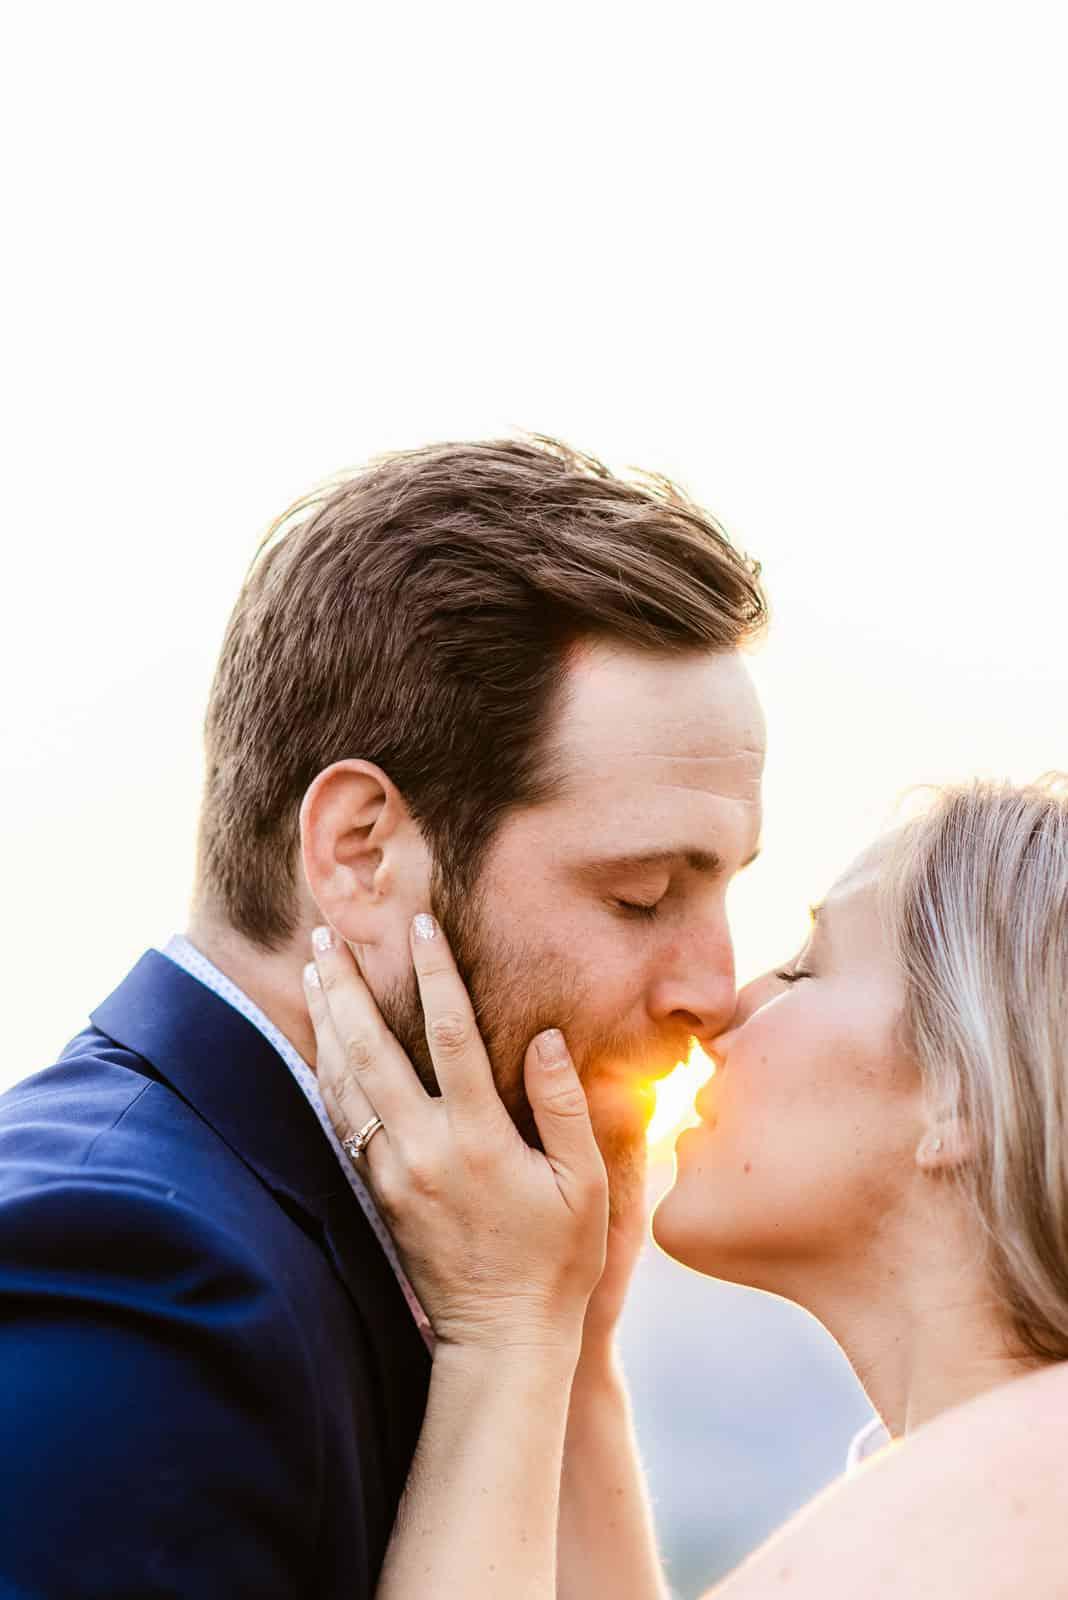 Romantic Elopement | Josie V Photography